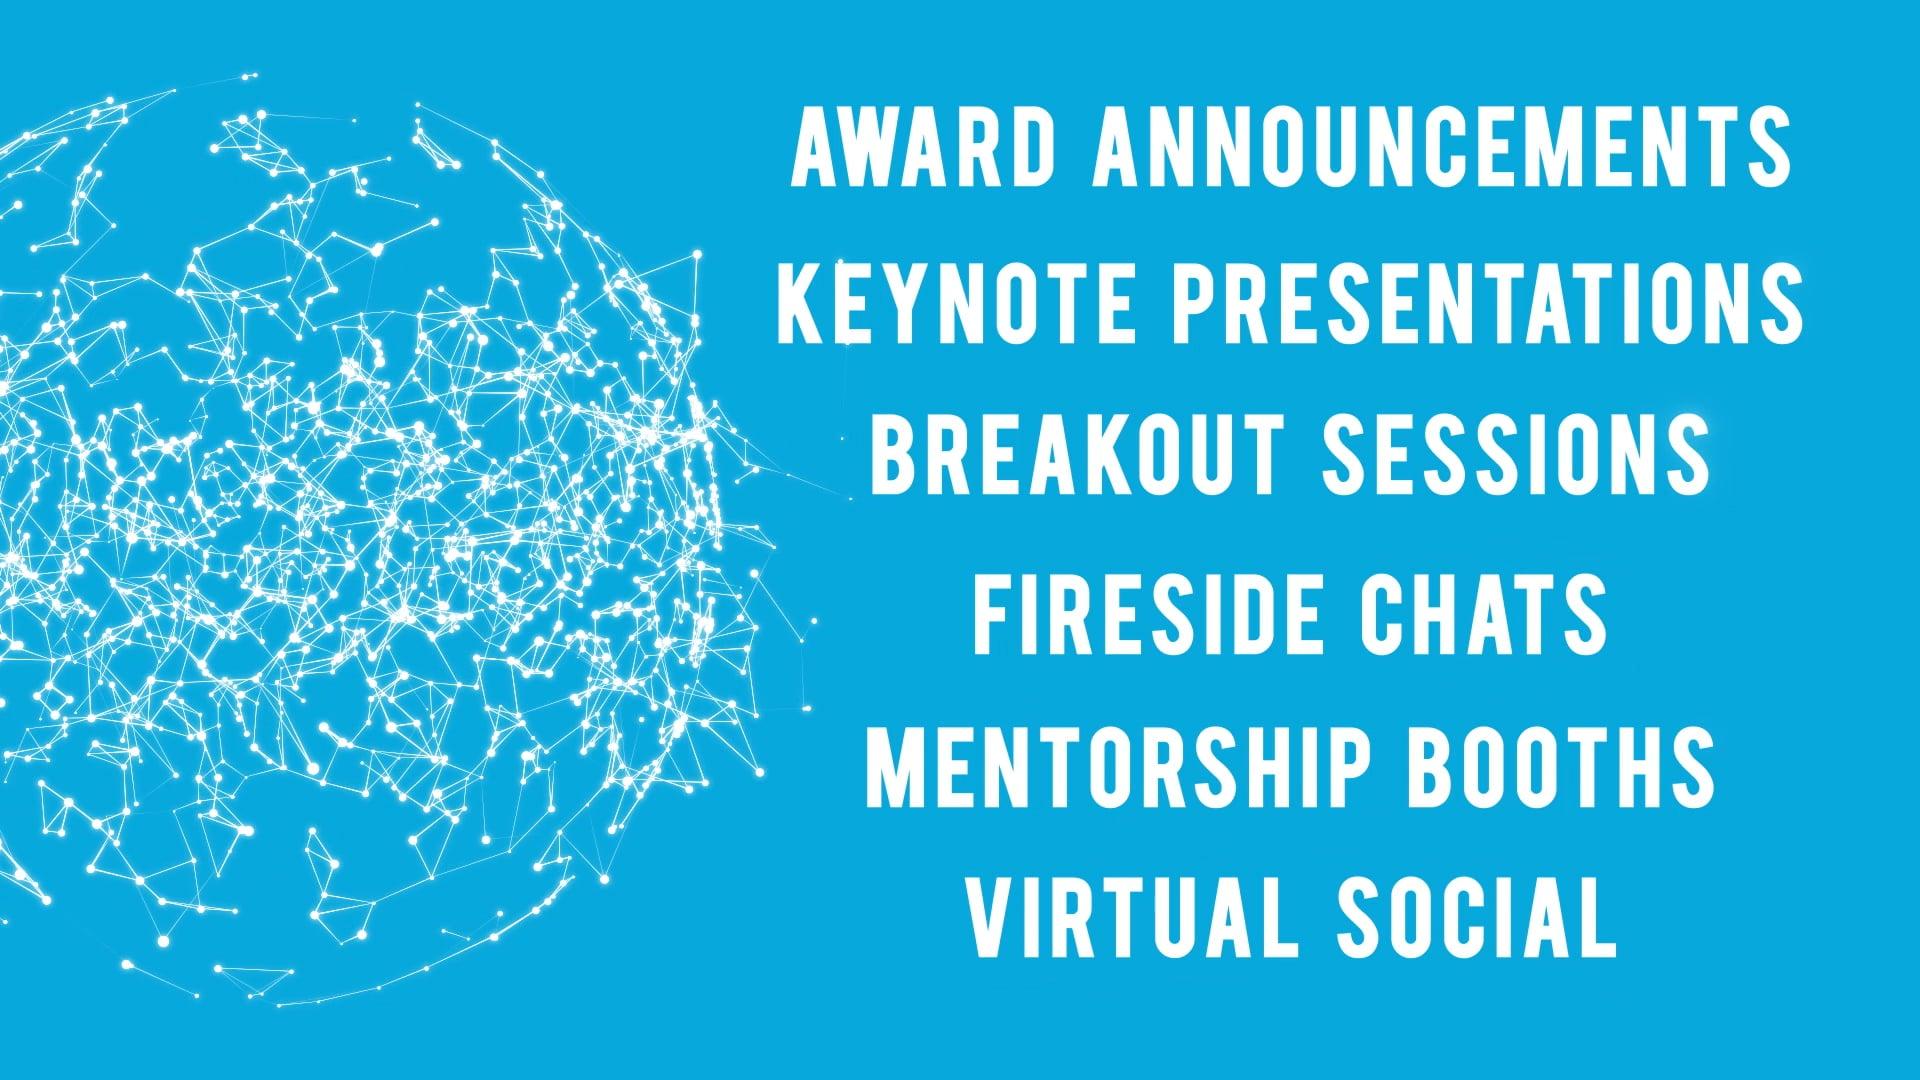 Digital Health Awards 2020 Preview